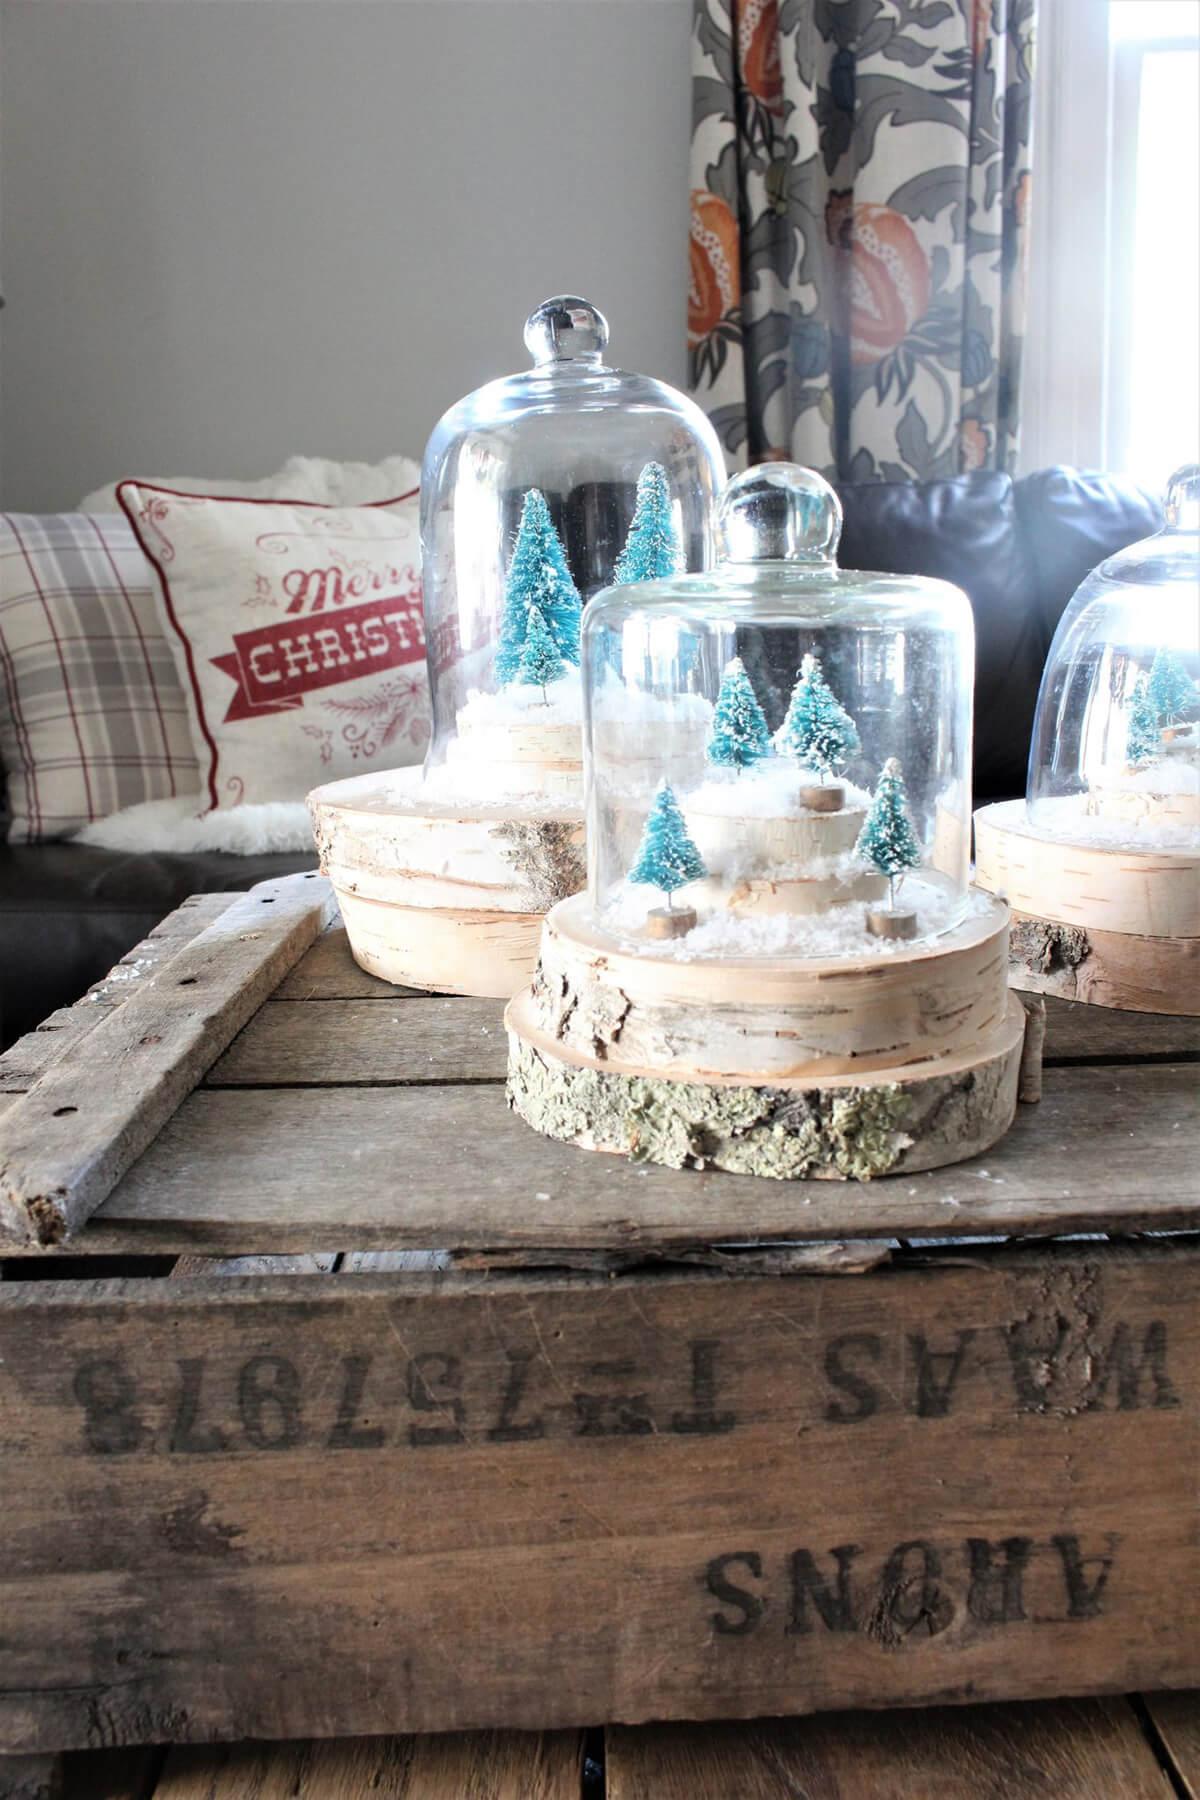 Holiday Sliced Wood Display Dome